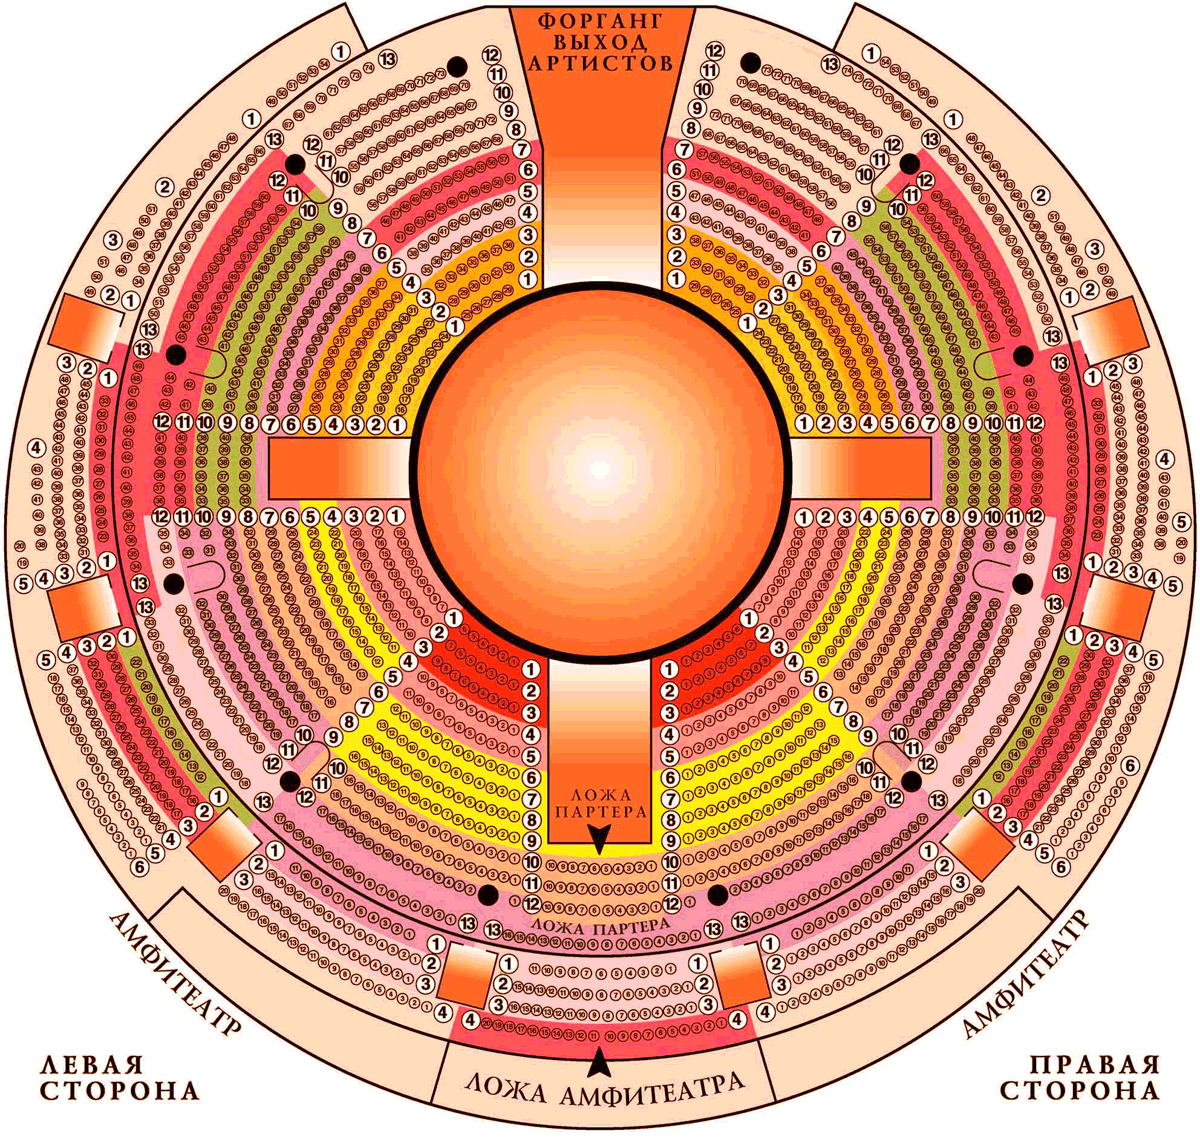 Ниже приведена схема цирка на Цветном бульваре.